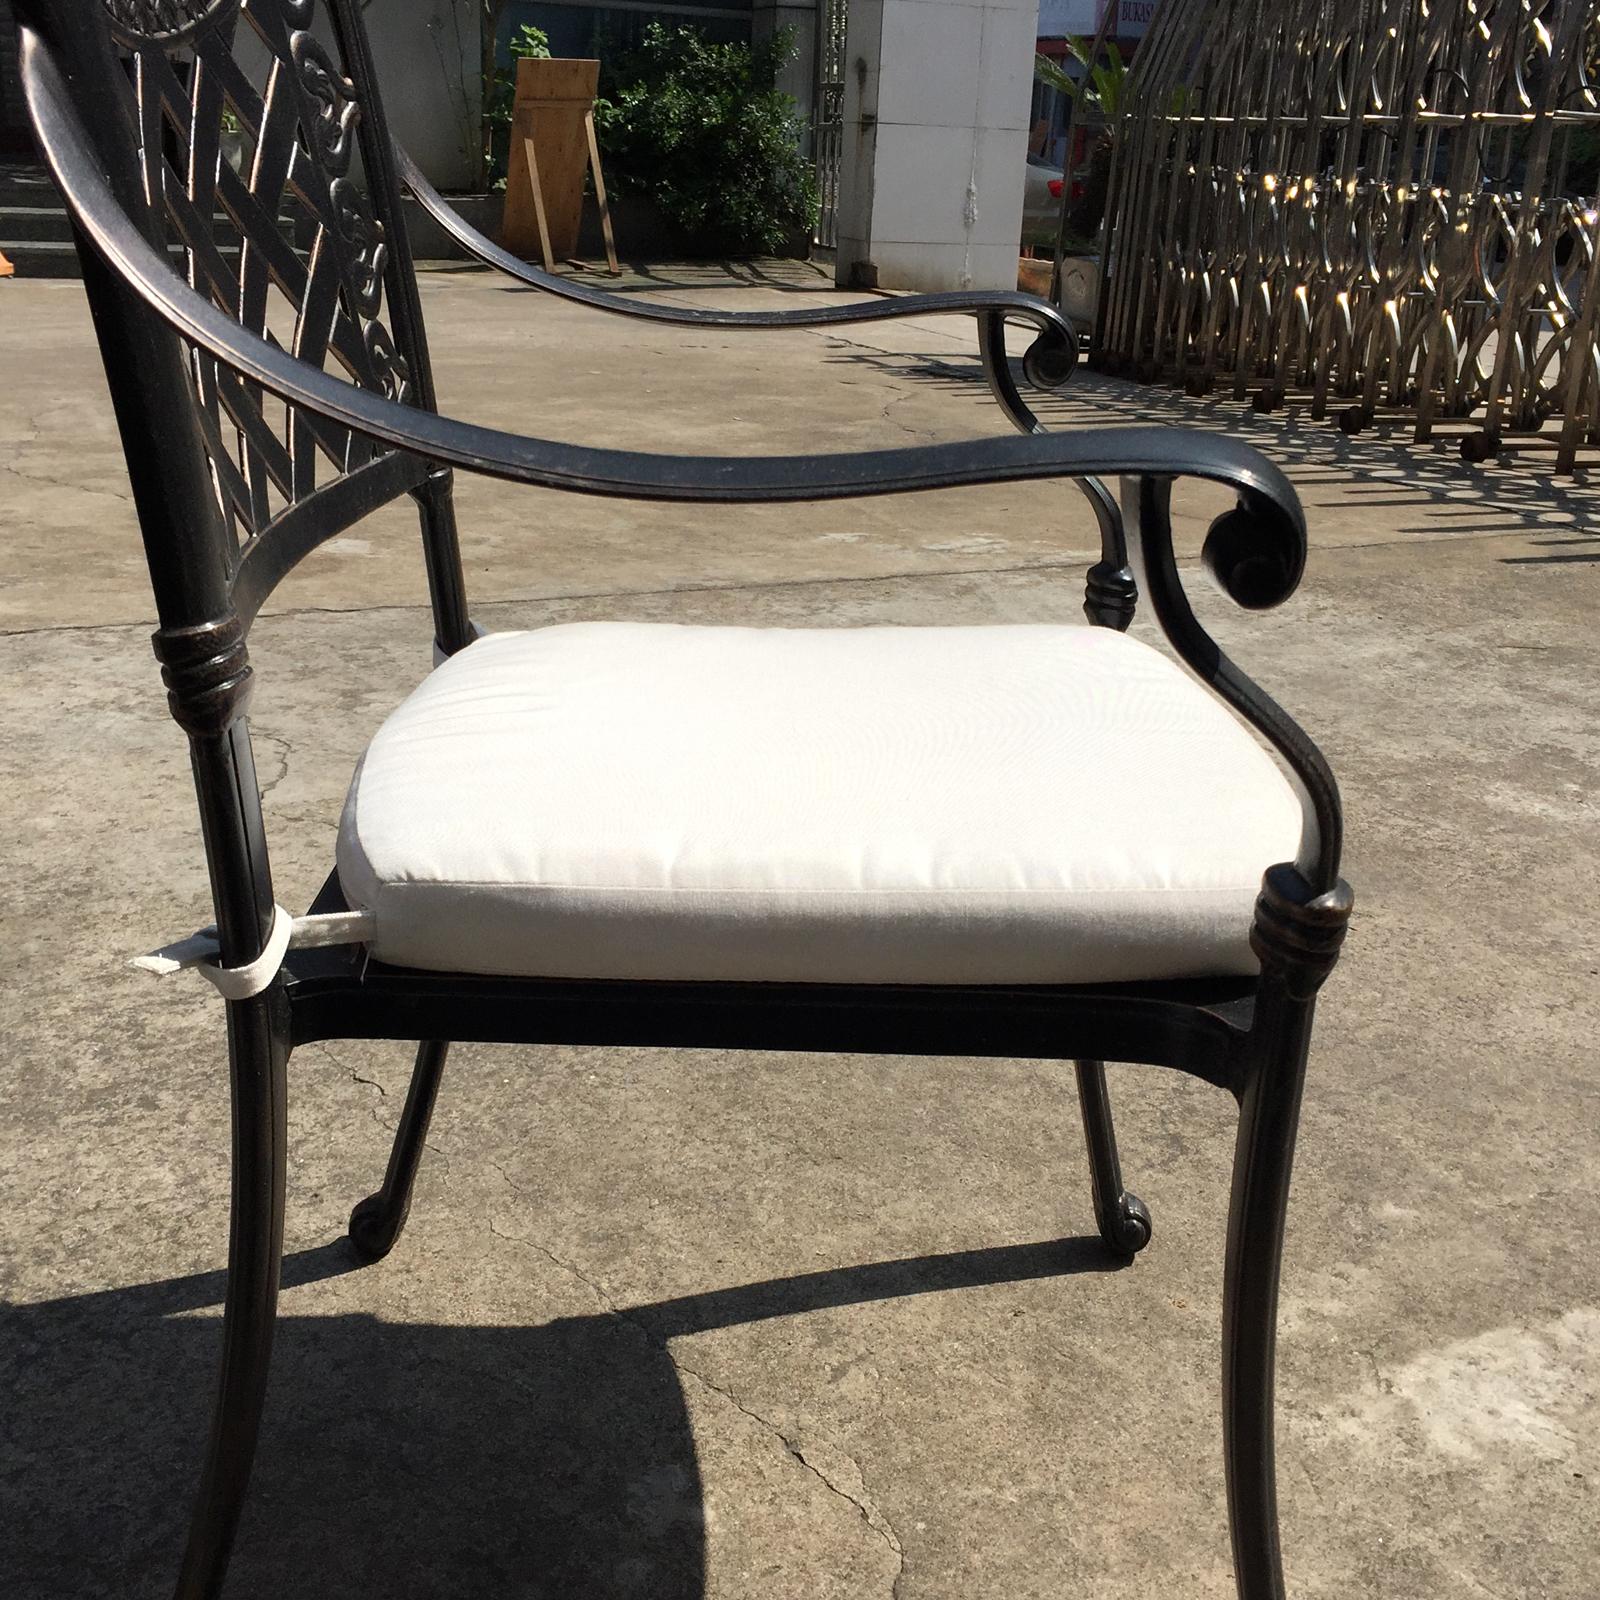 Sunbrella Patio Chair 39 S Cushions Removable Outdoor Cover Foam Seat Pad Wa